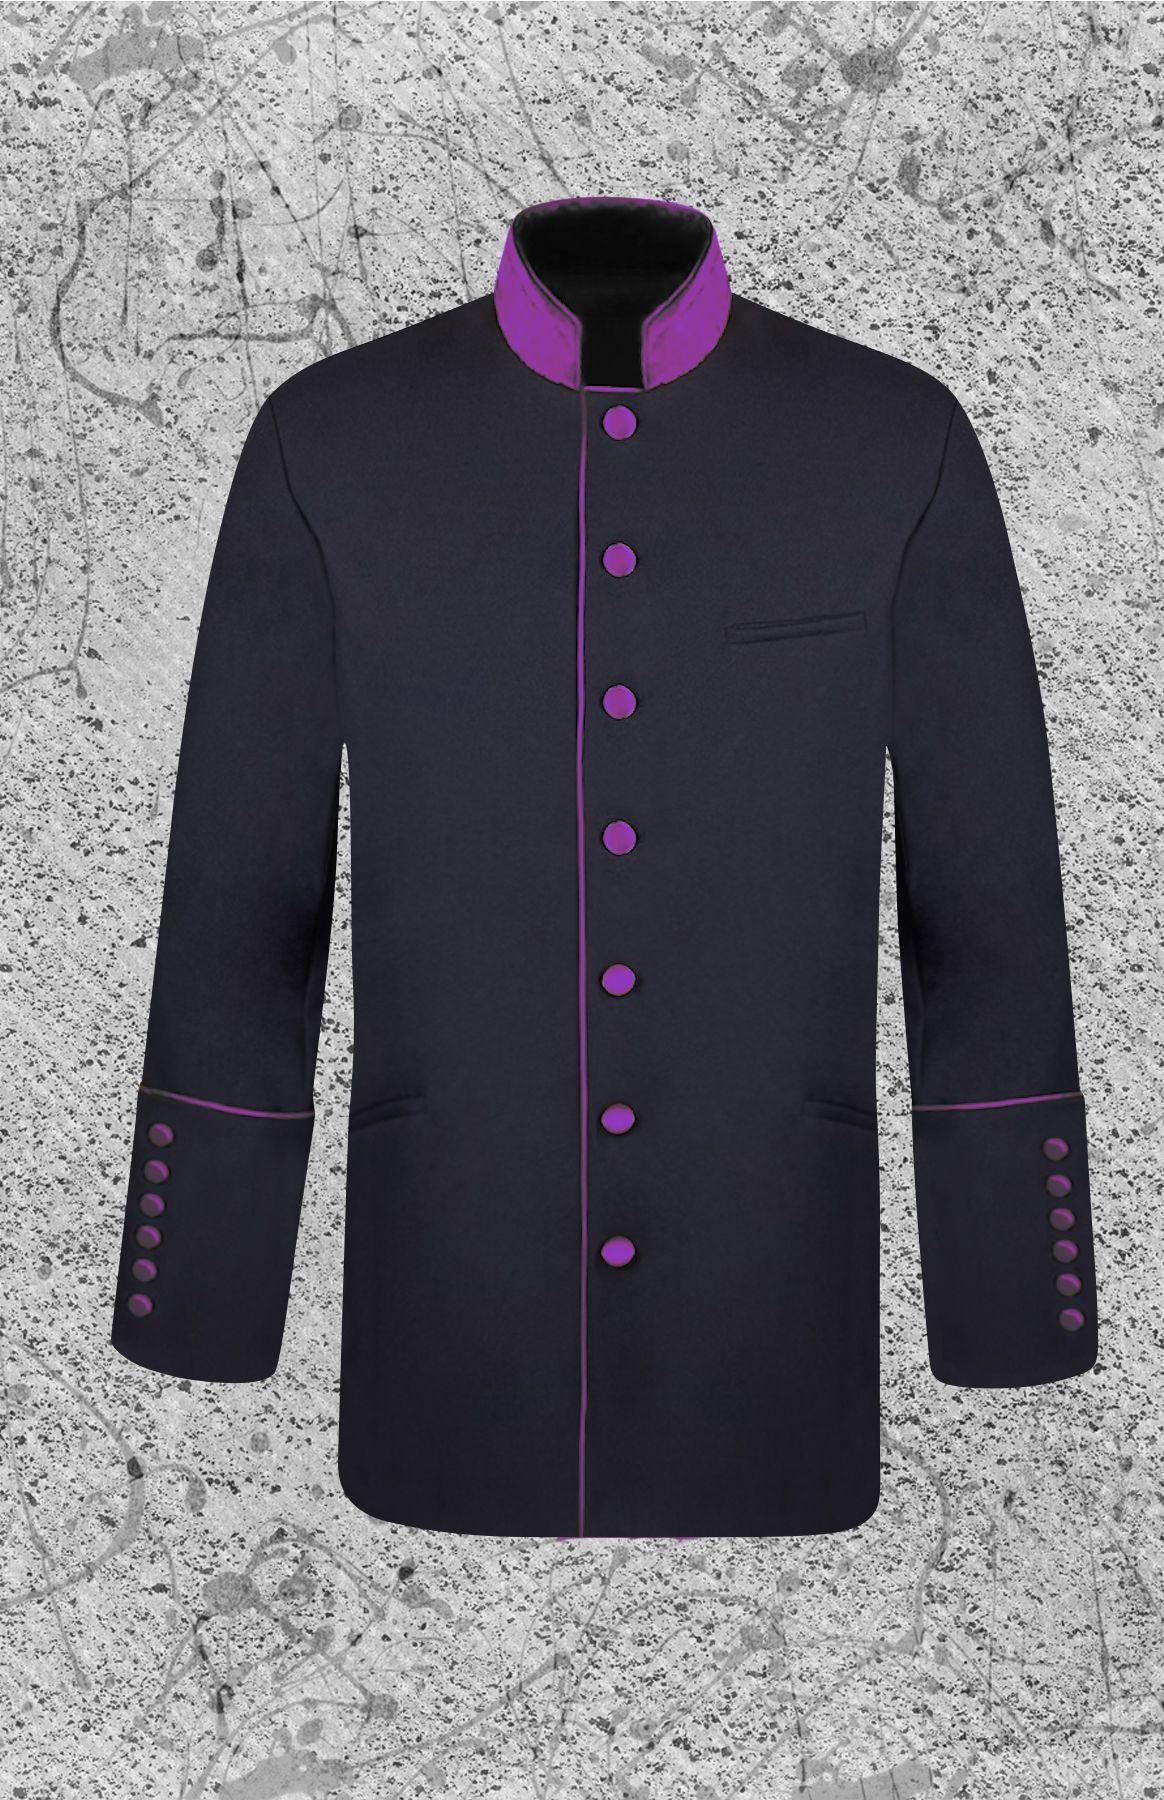 Men's Black and Purple Clergy Jacket